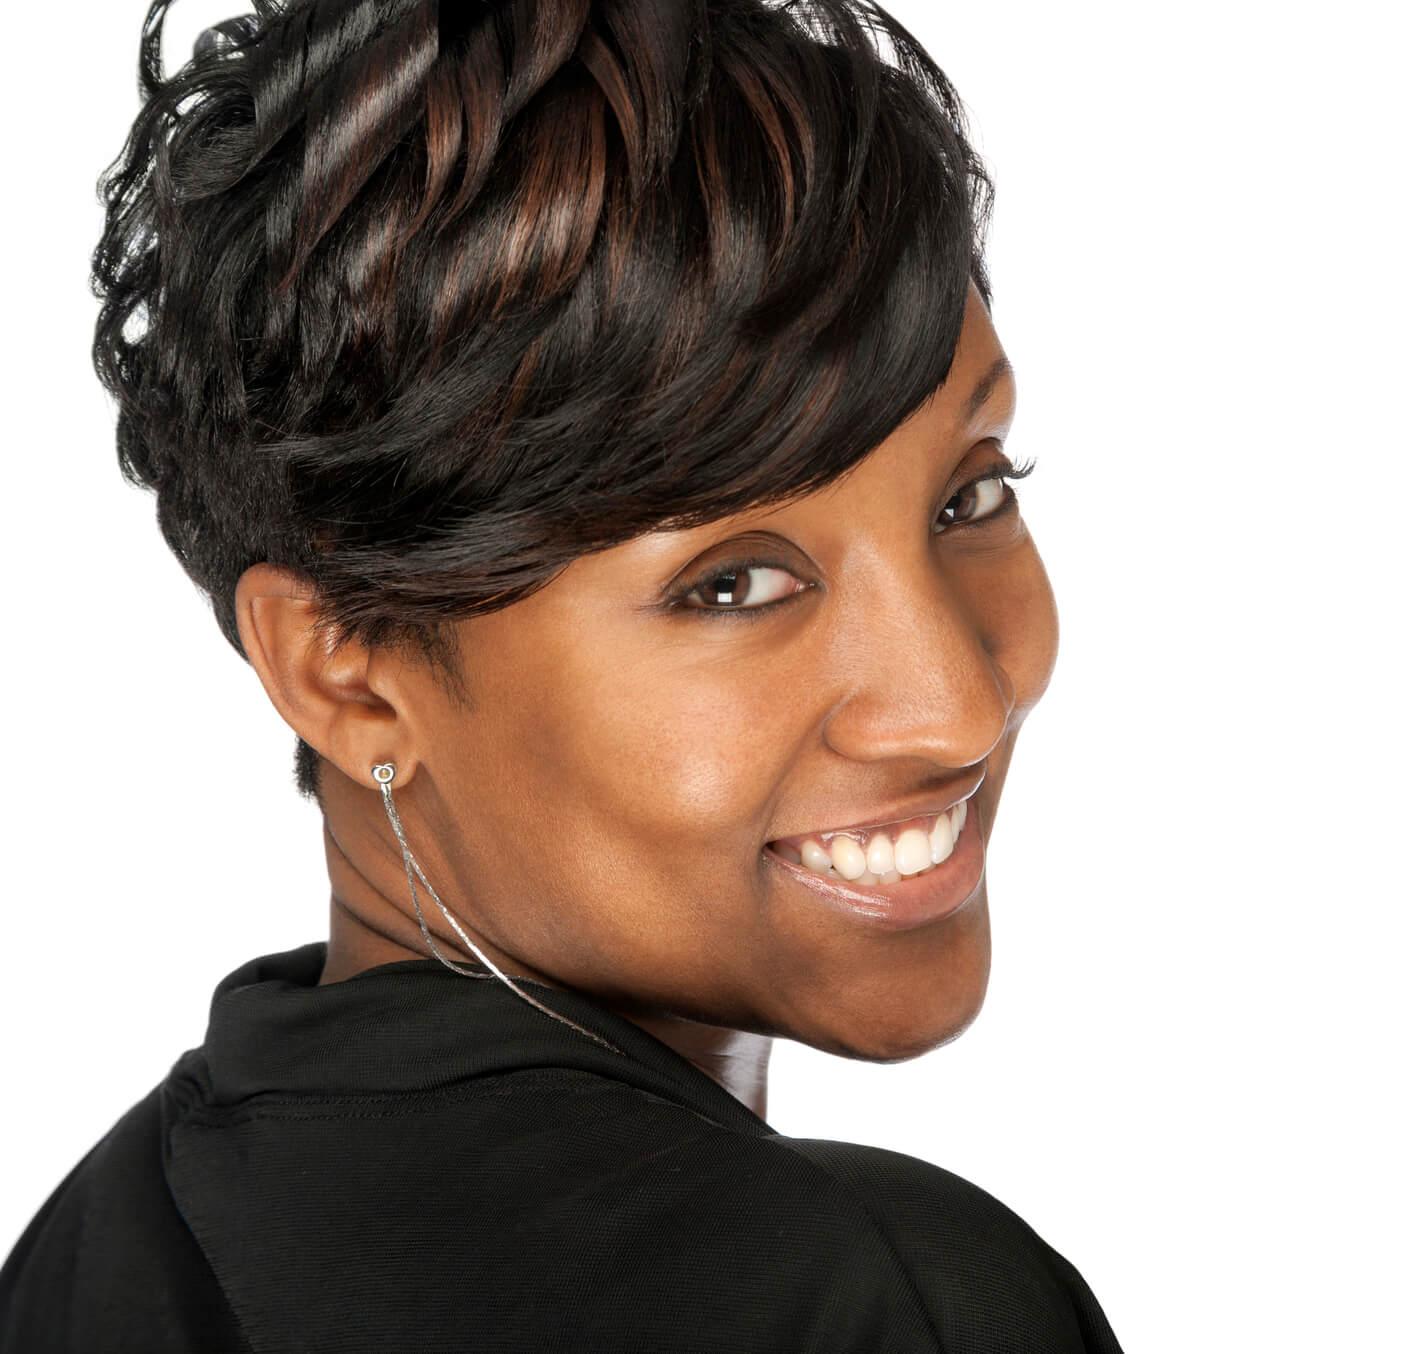 Short Hairstyles For Black Women 2016